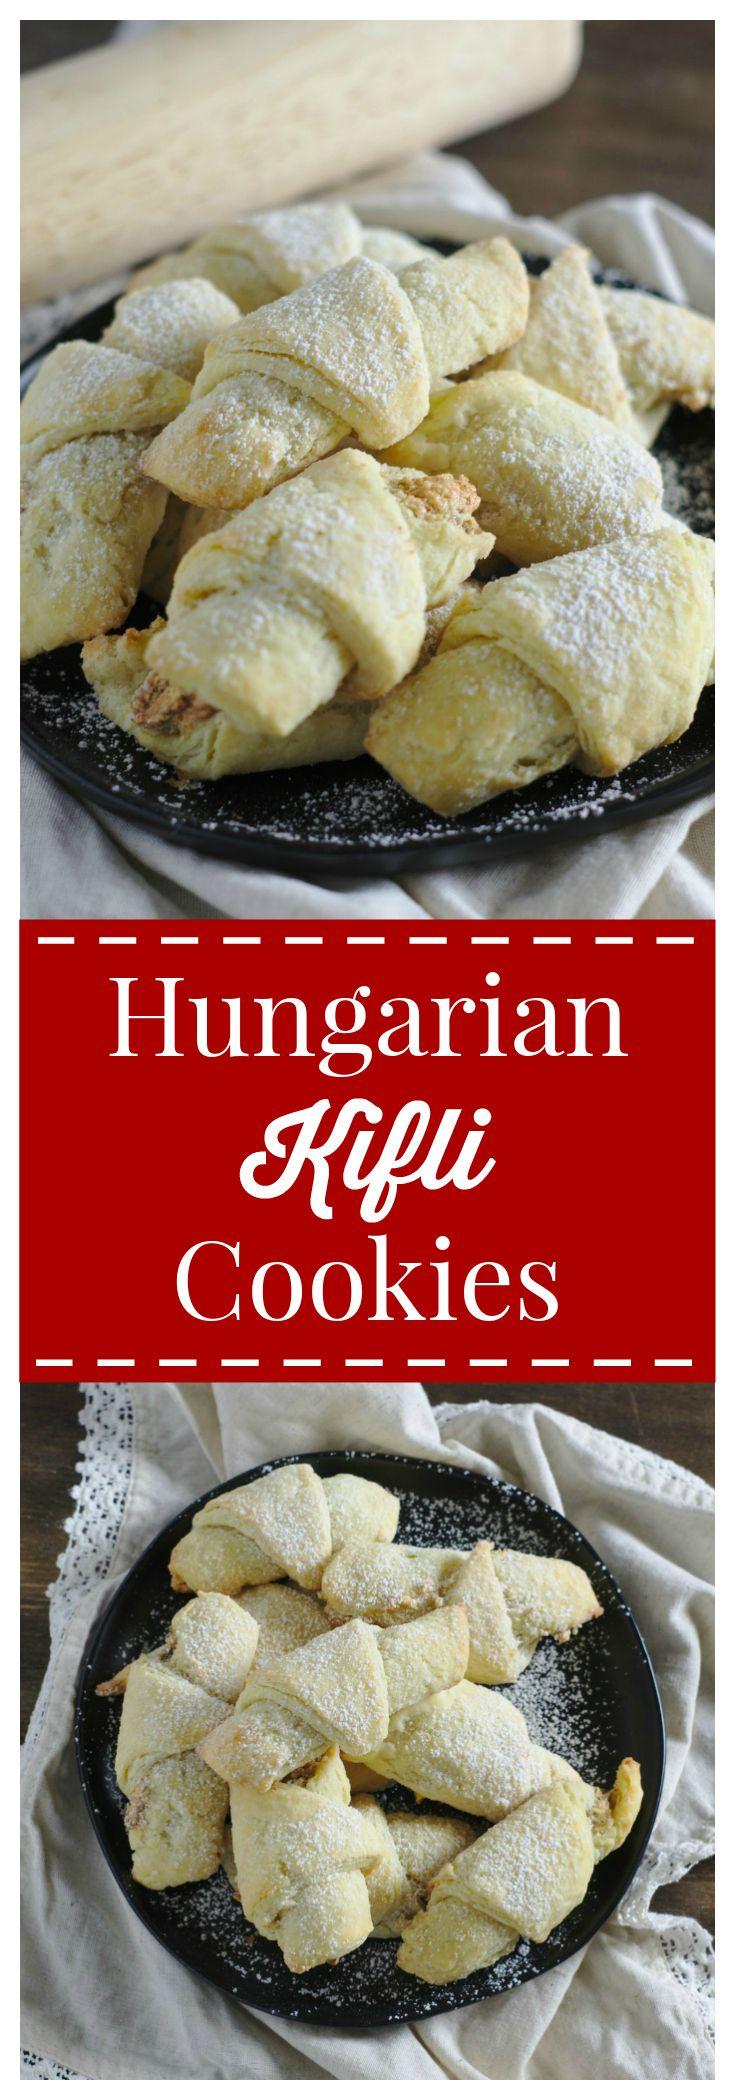 Hungarian Kifli Cookies Recipe Easy Cookie Recipes Yummy Cookies Recipes